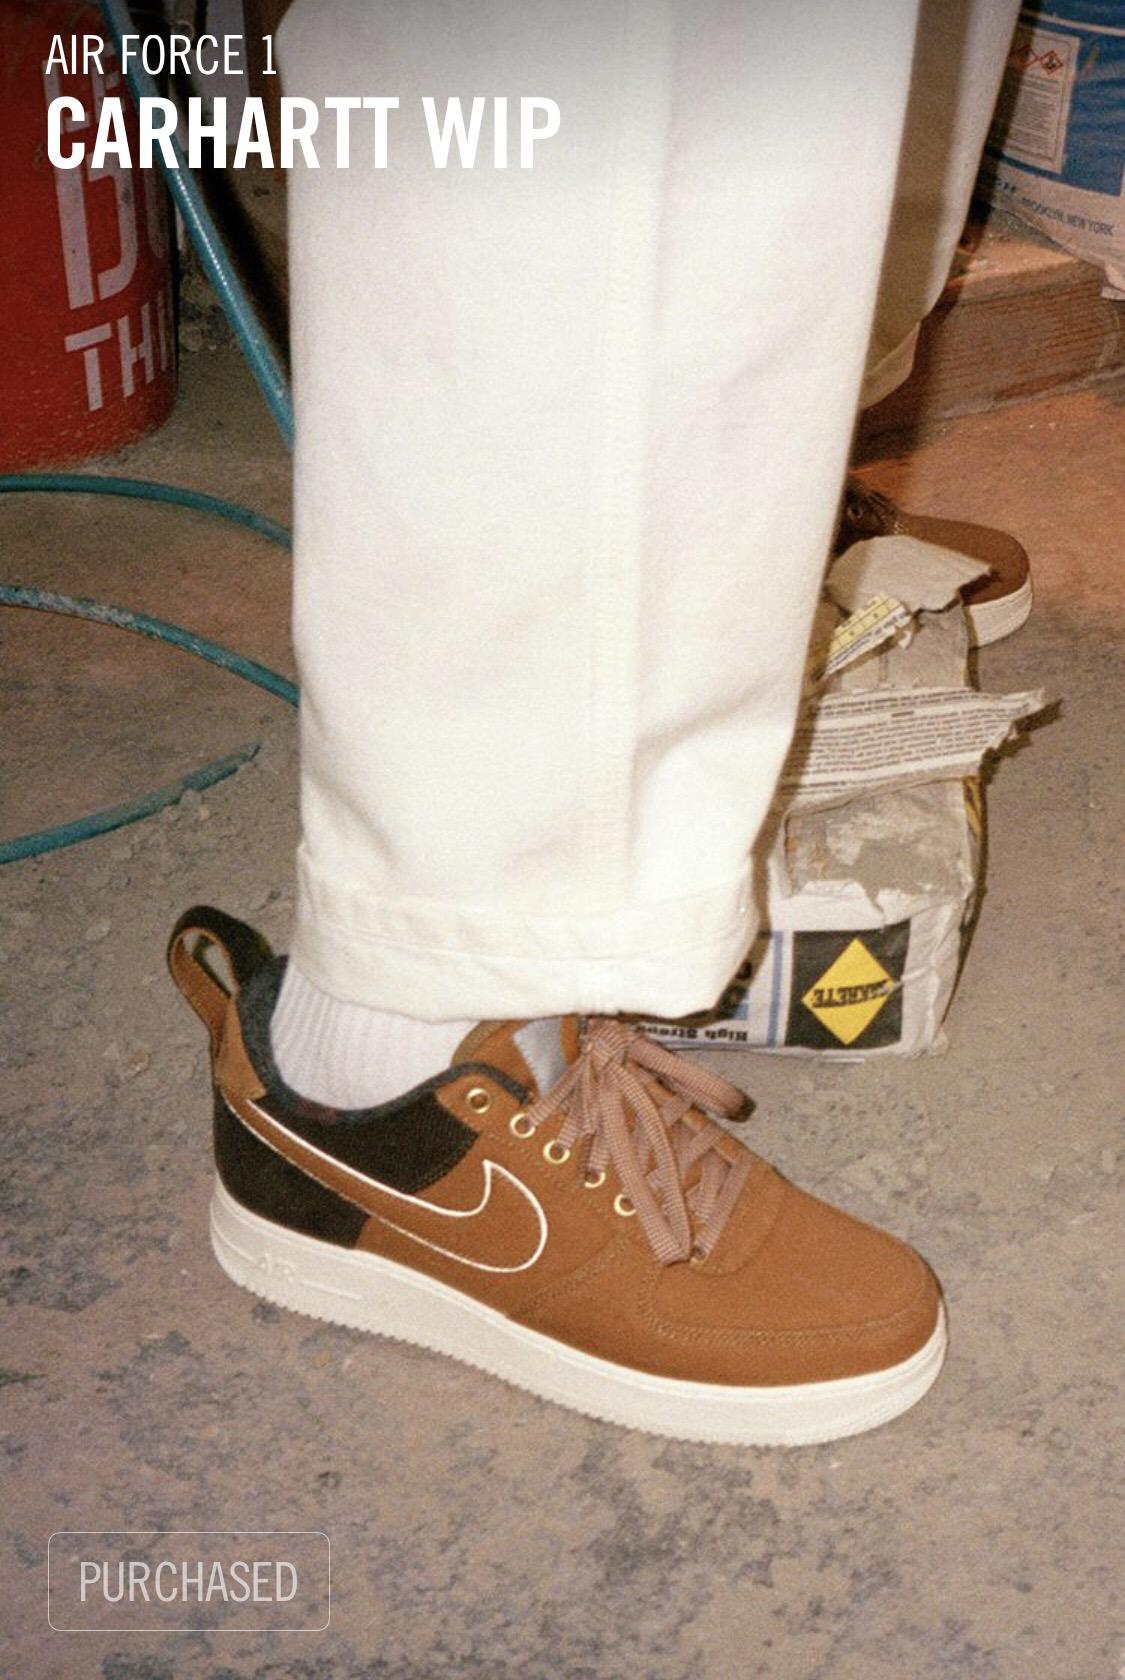 Nike Air Force 1 Carhartt WIP